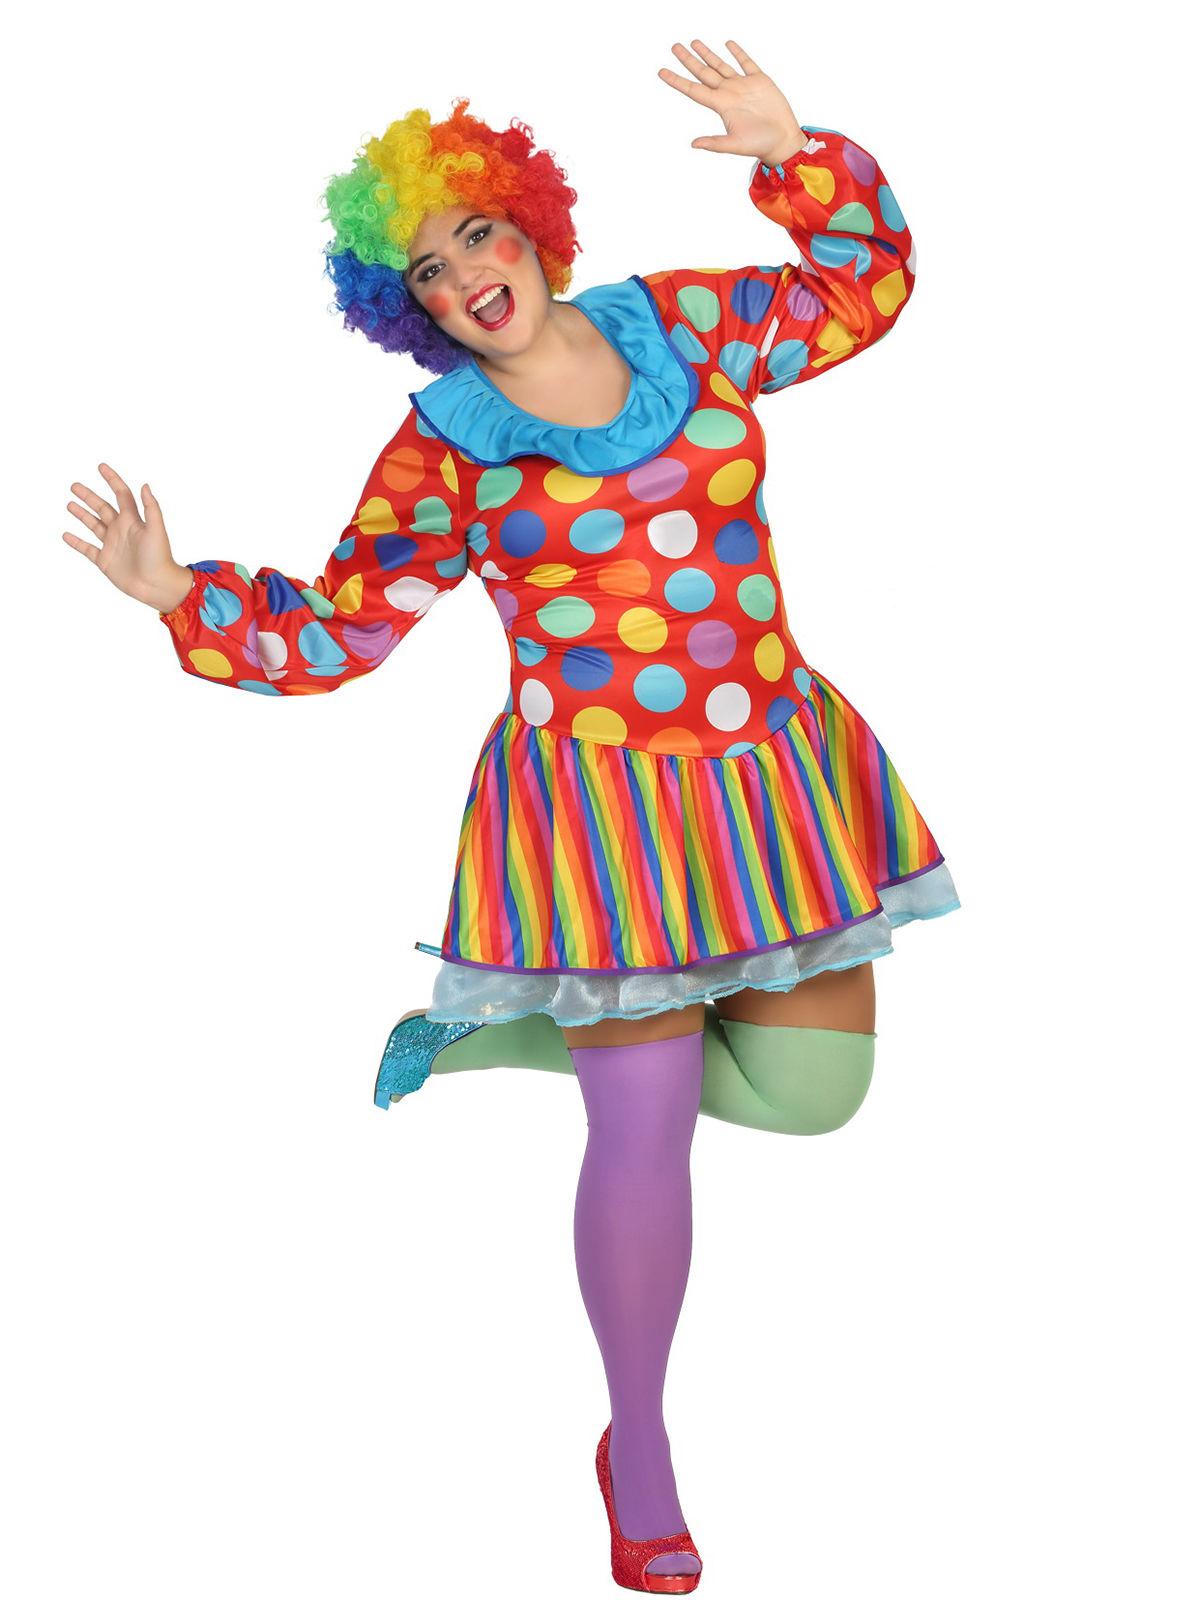 Carnavalskleding Dames Clown.Clownspak Voor Dames Volwassenen Kostuums En Goedkope